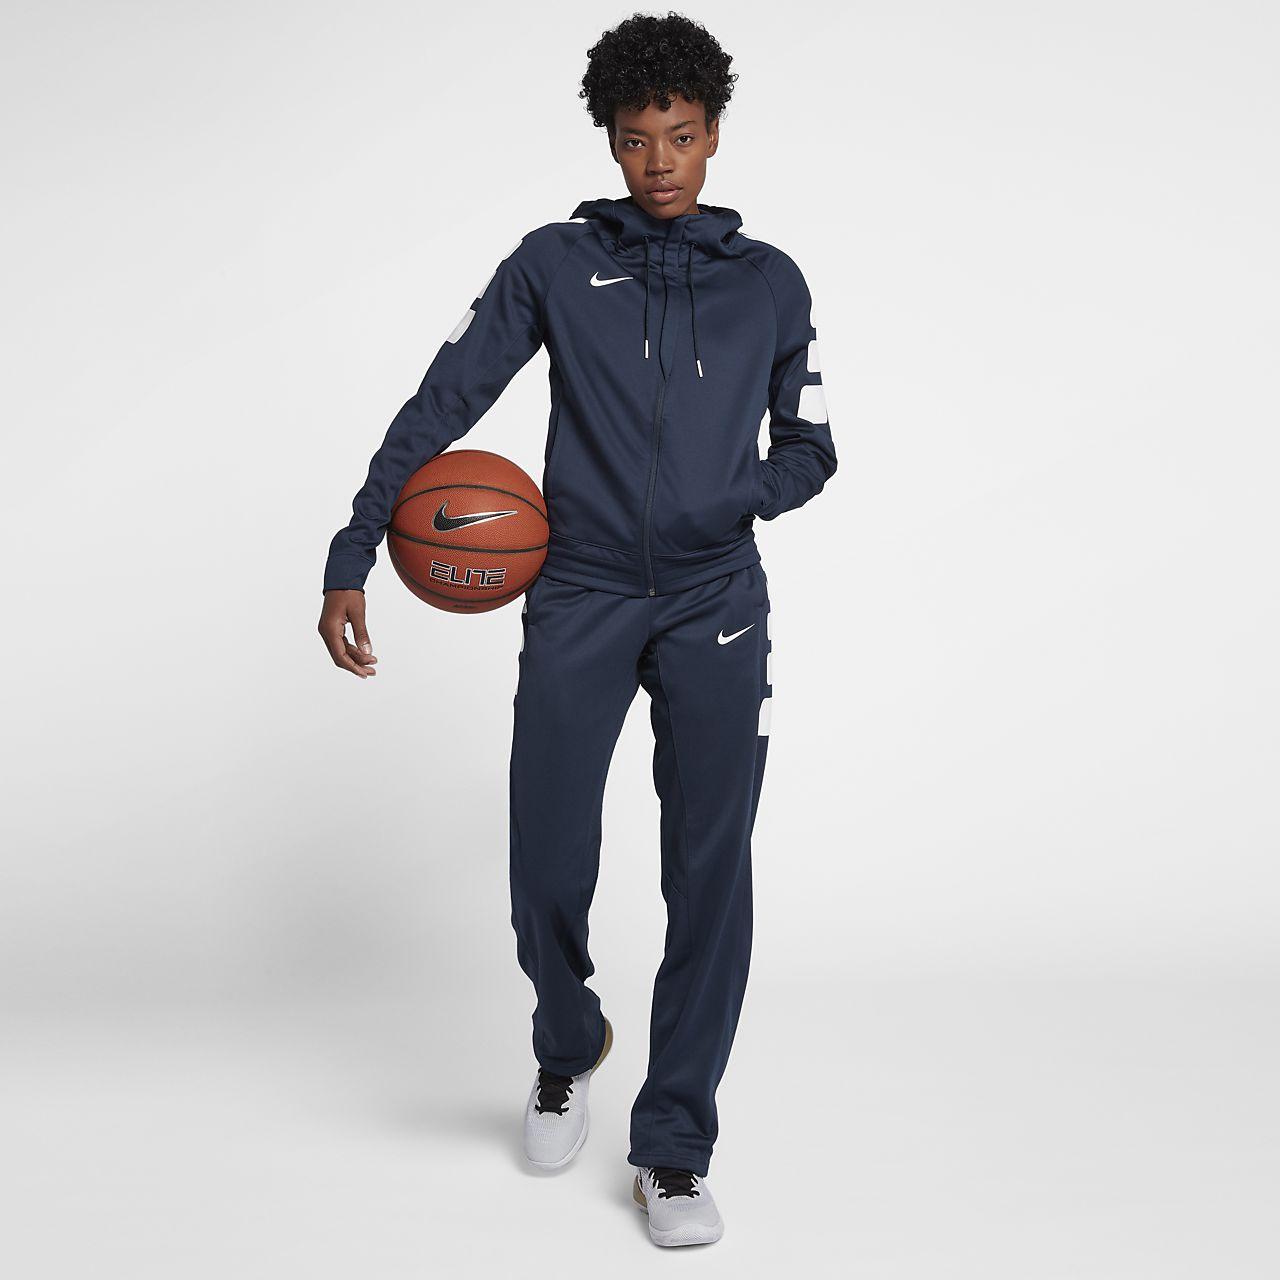 b4ad0565d7de Nike Therma Elite Women s Basketball Hoodie. Nike.com